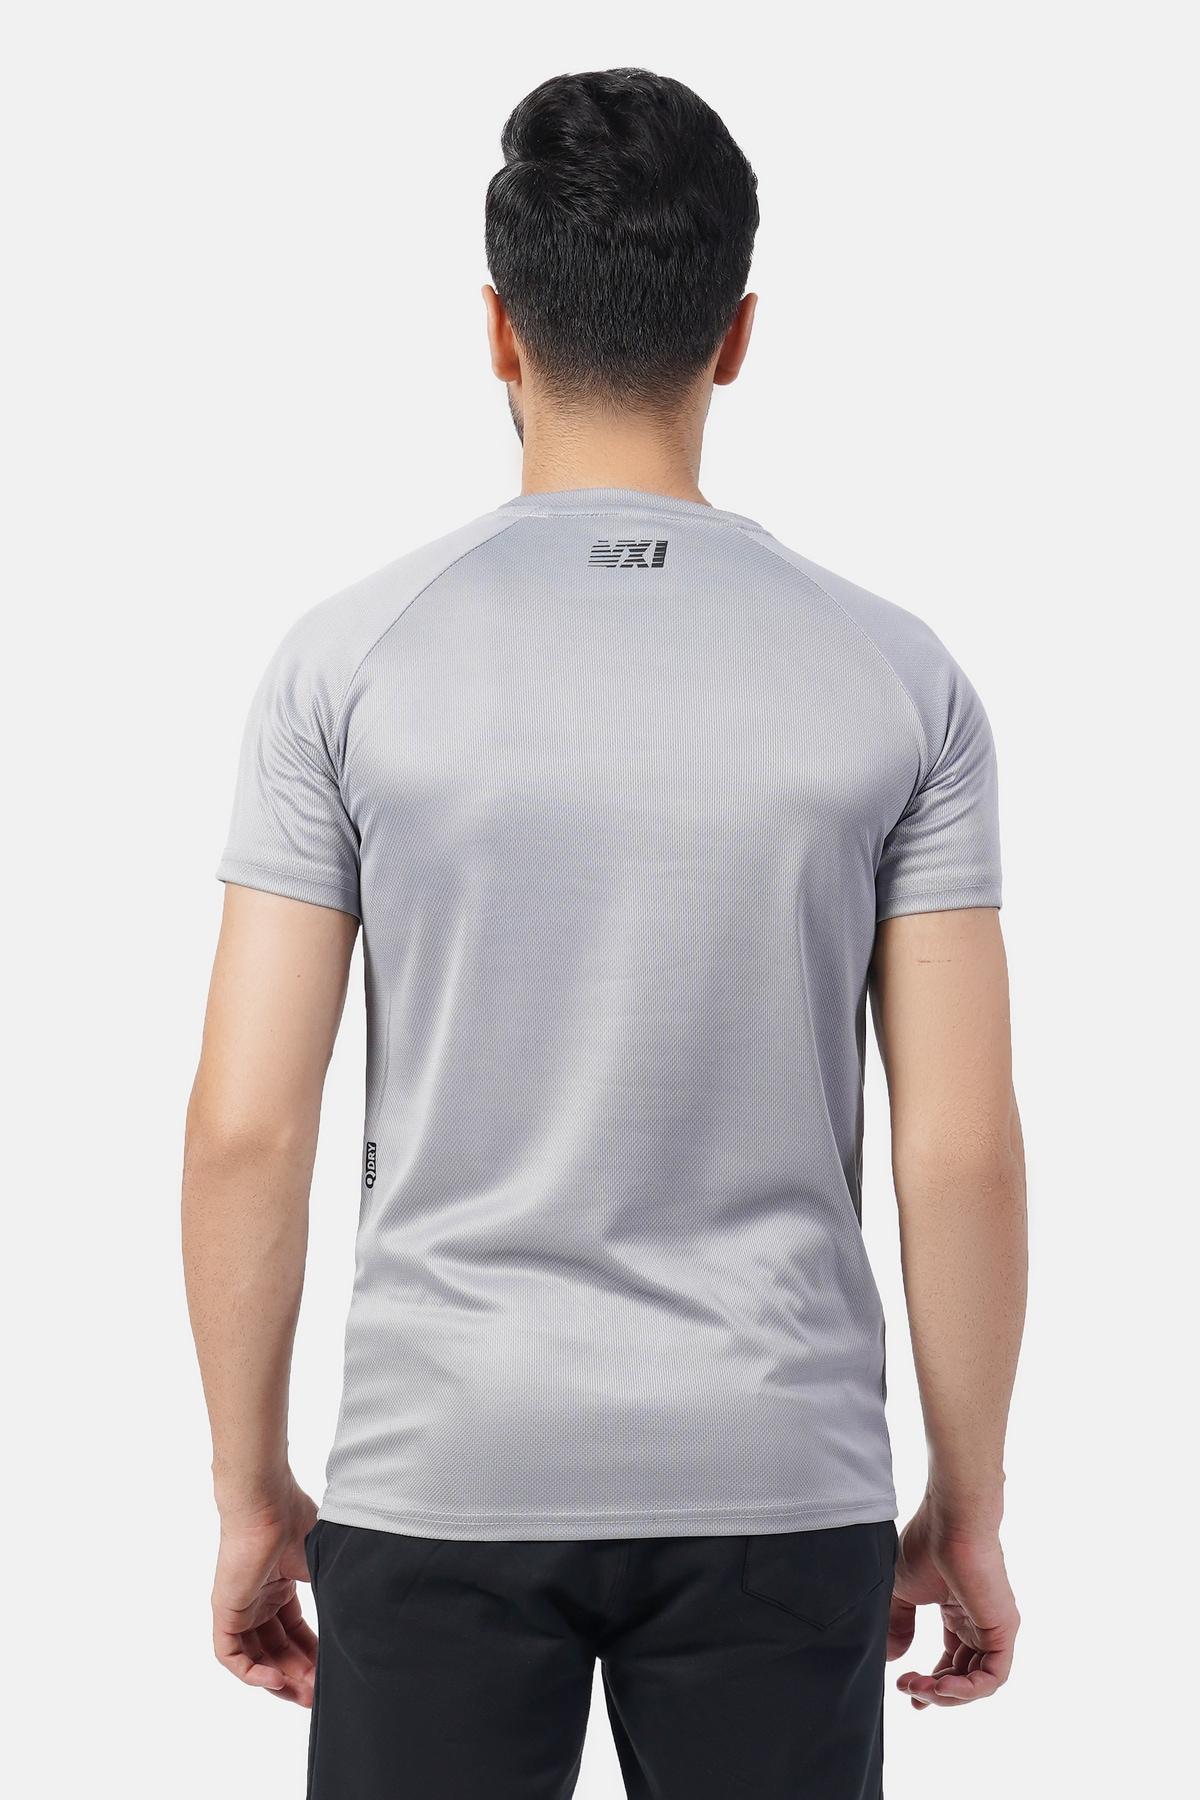 Micro Mesh Men's Gray T-Shirt